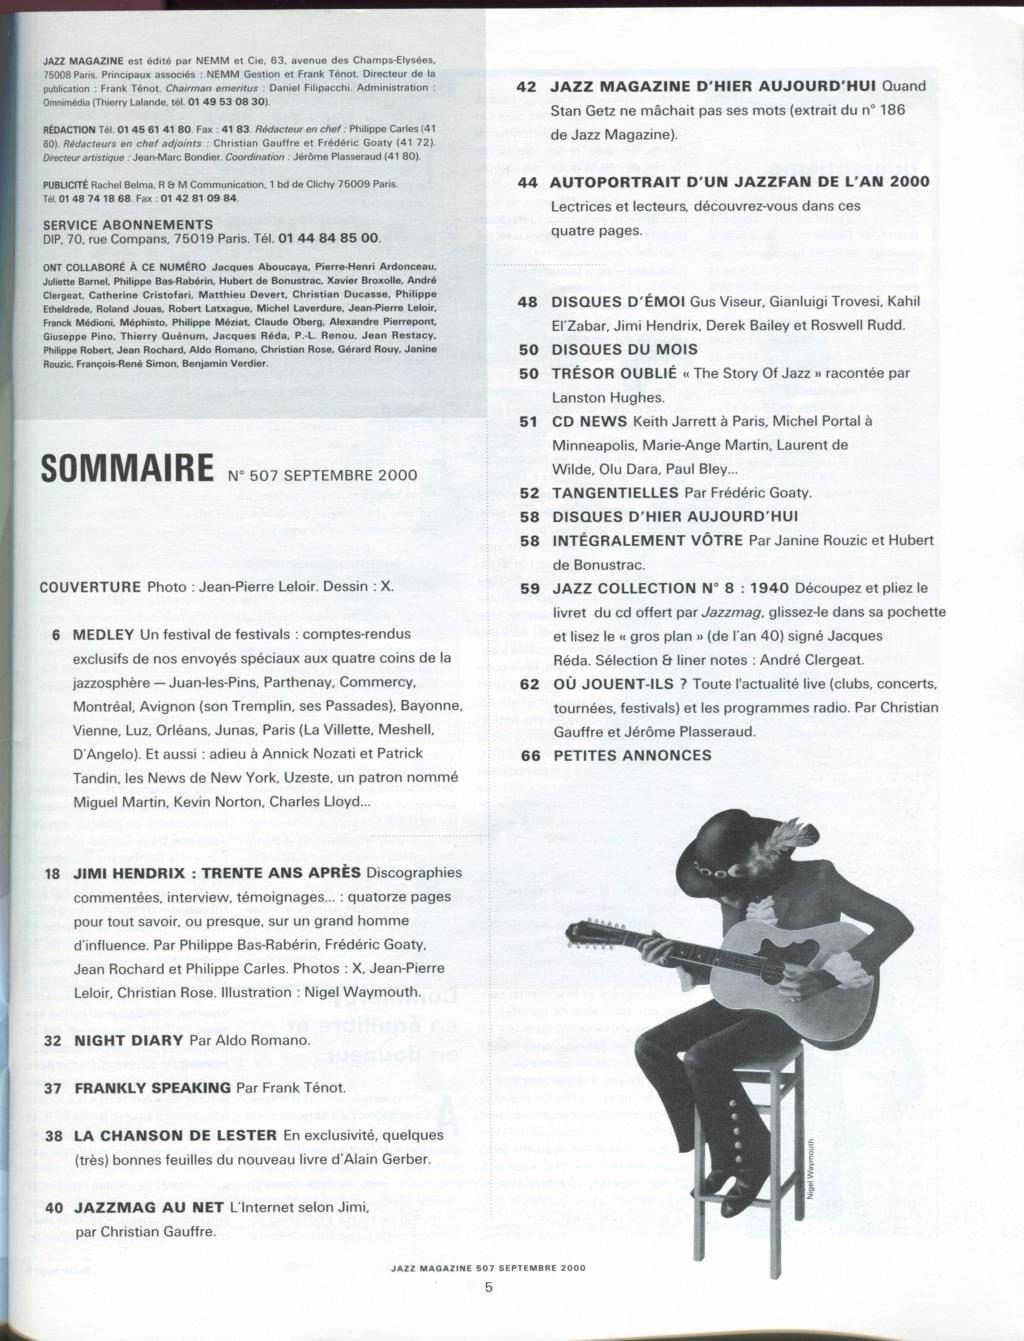 Magazines Français 1989 - 2014 - Page 2 1990_134